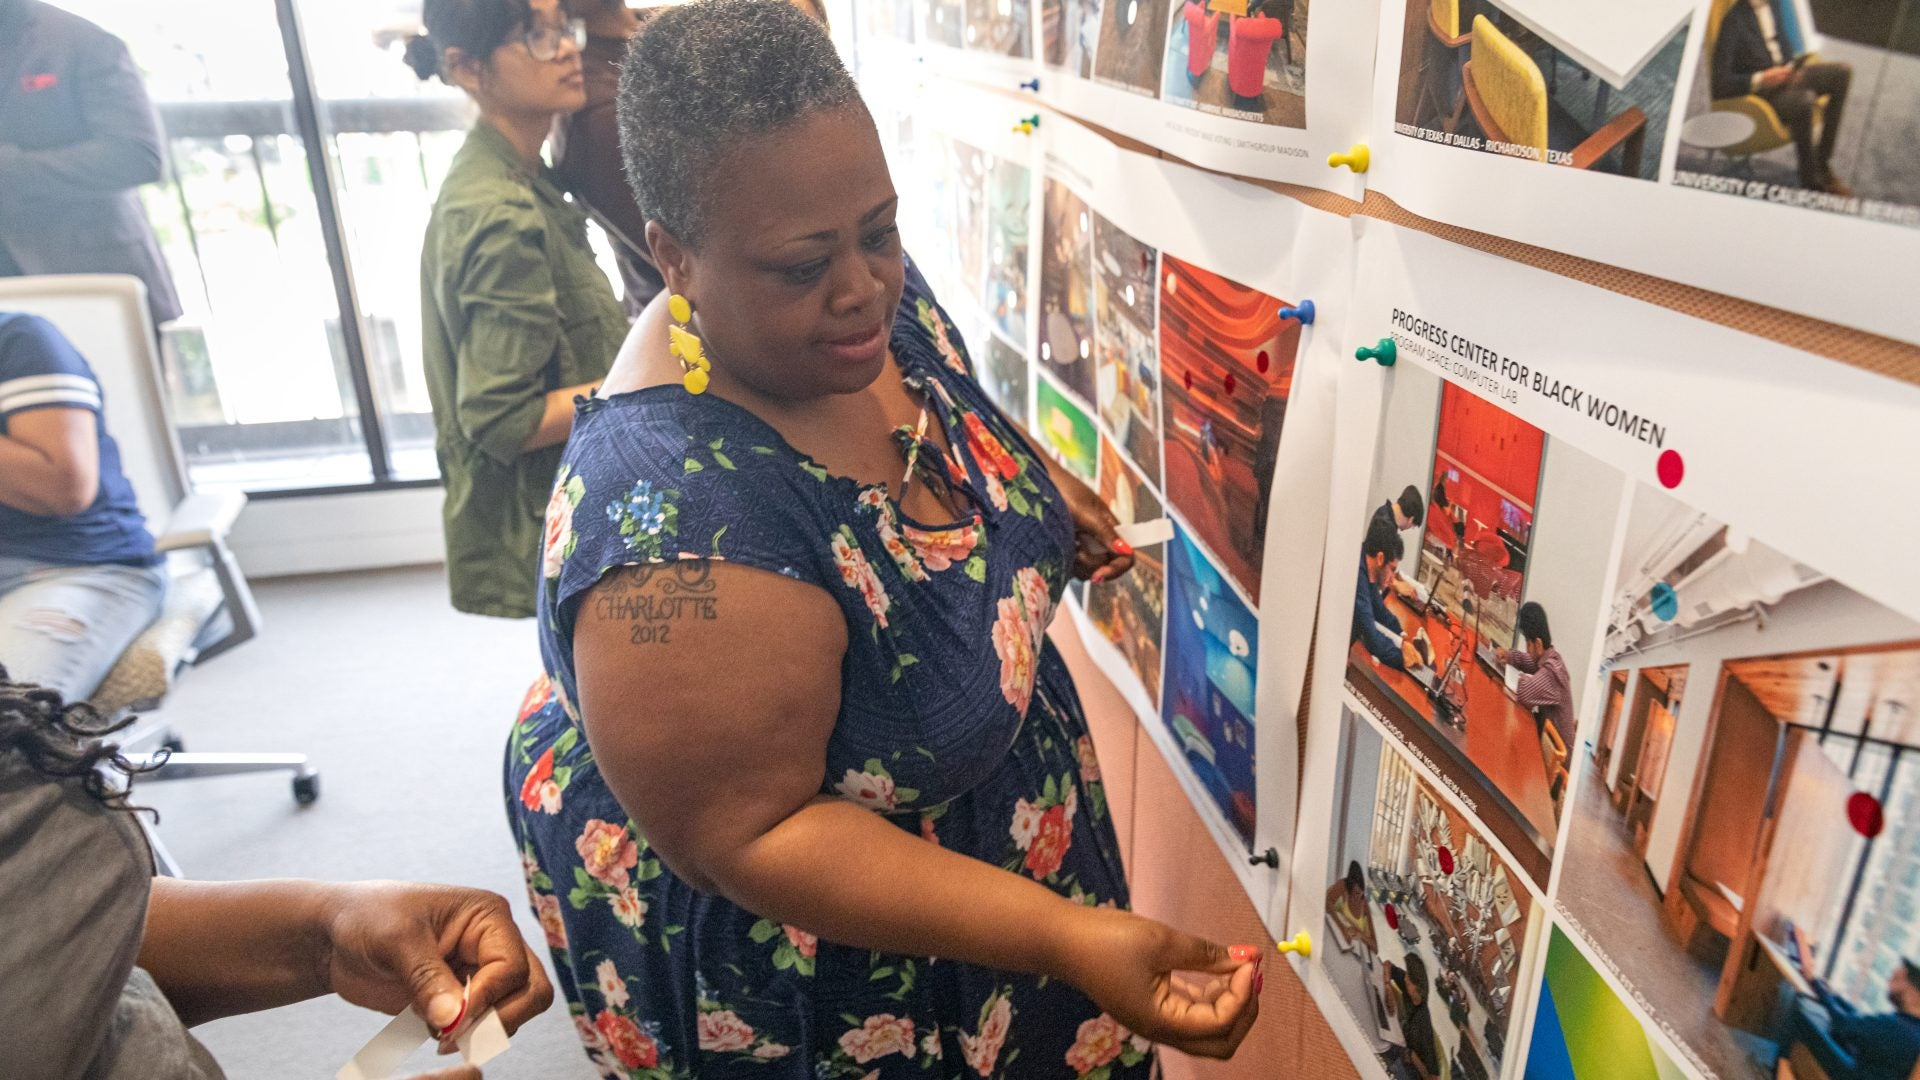 Community Designs Permanent Home For Progress Center For Black Women